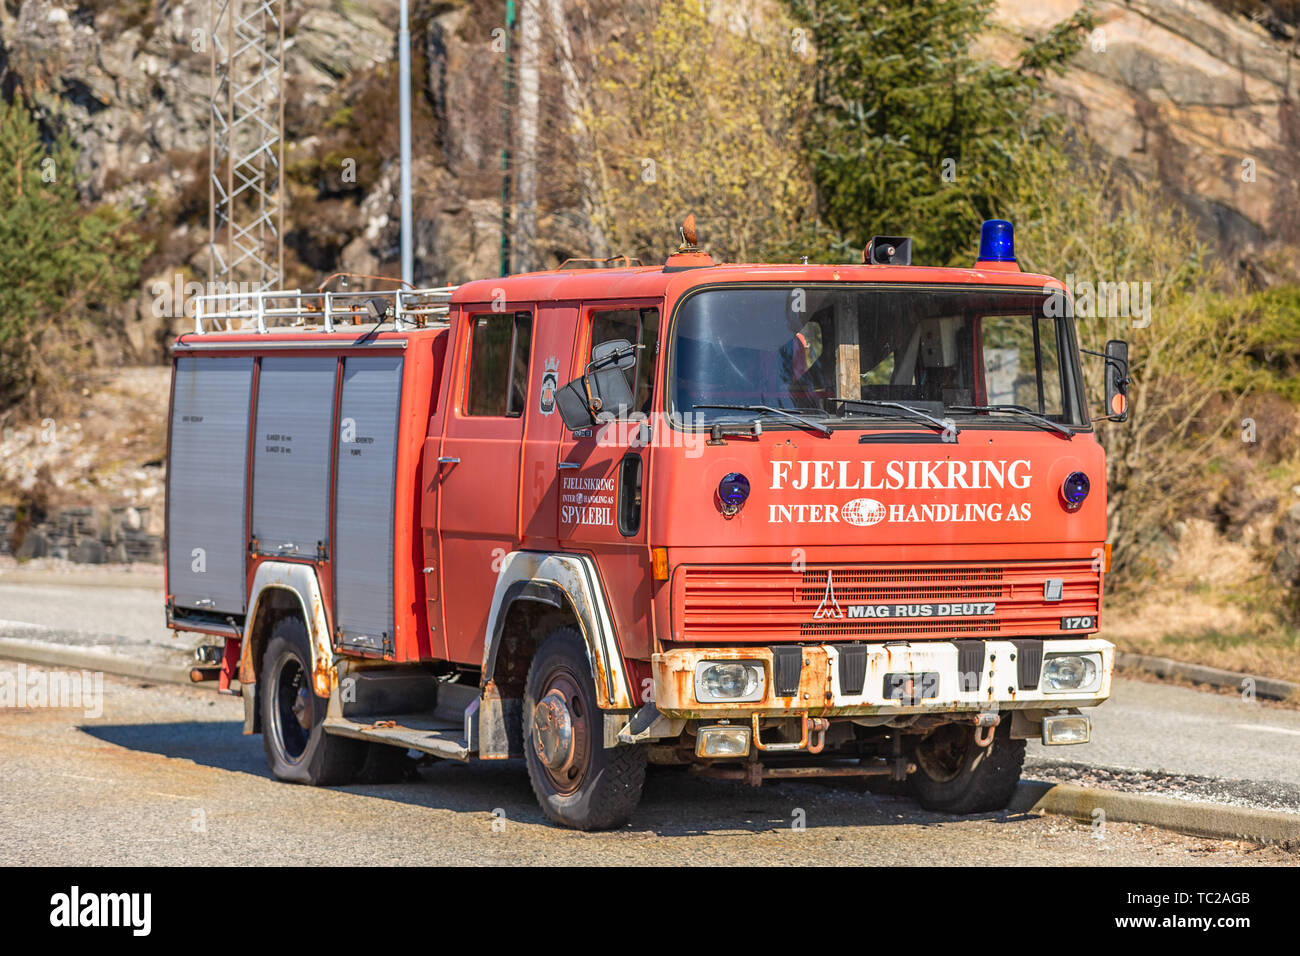 BERGEN, NORWAY - April 14, 2019: Old firefighters vehicle on street in Bergen, Norway. Stock Photo